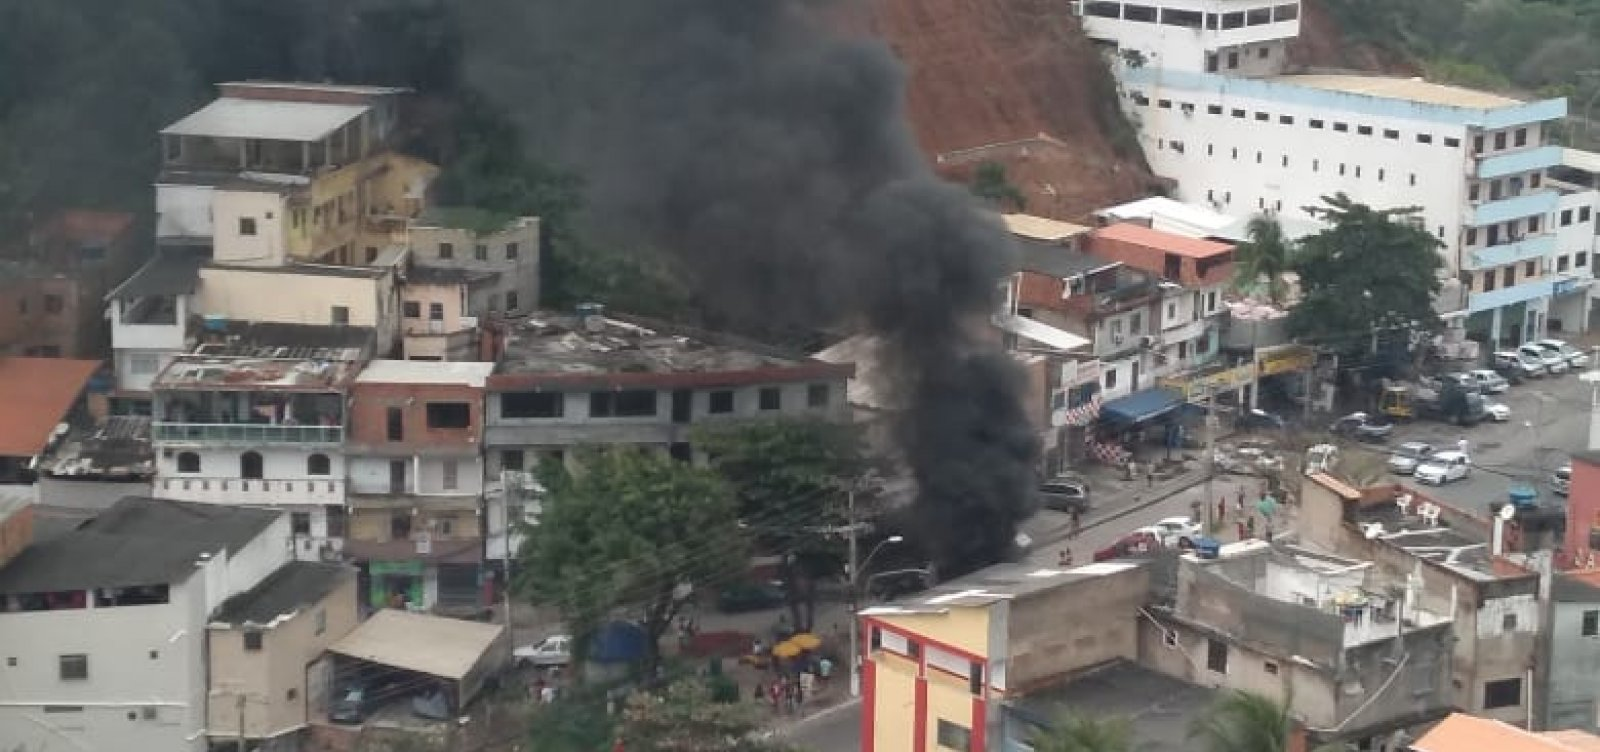 [Manifestantes bloqueiam trânsito na Av. Jorge Amado; engarrafamento chega na Av. Paralela]